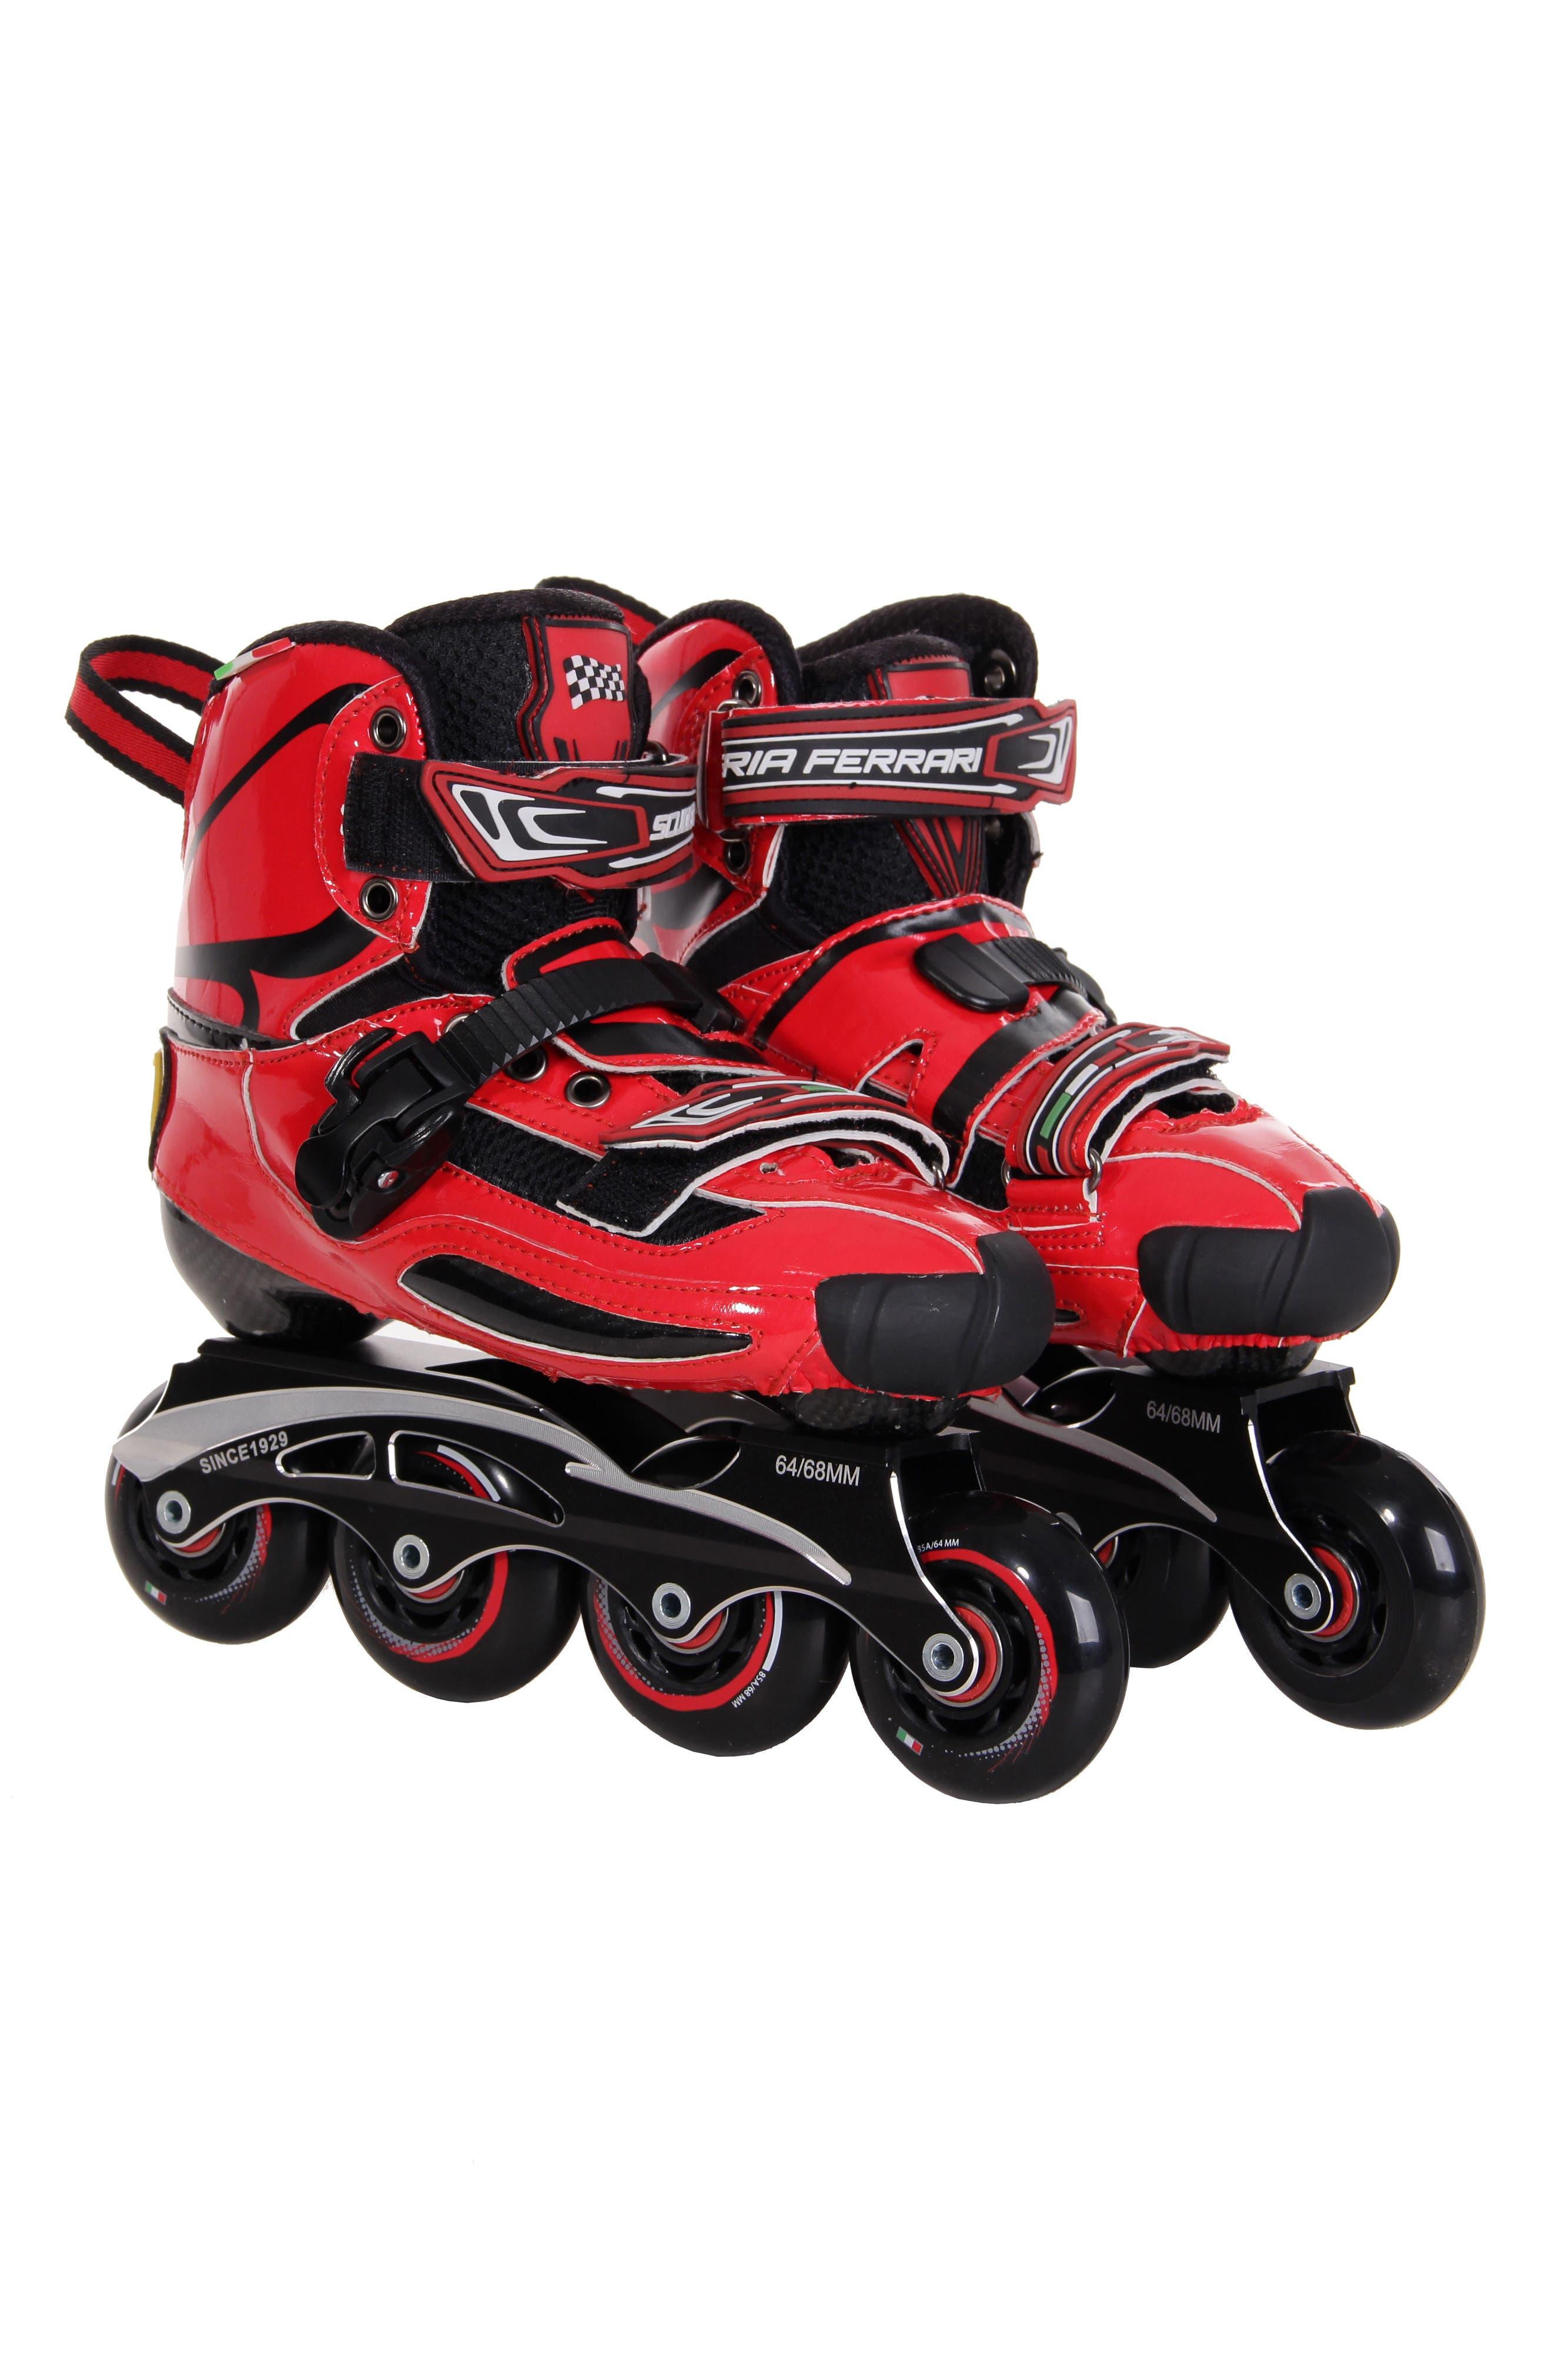 Main Image - Ferrari Carbon Fiber Slalom Inline Skates with Interchangeable Chassis